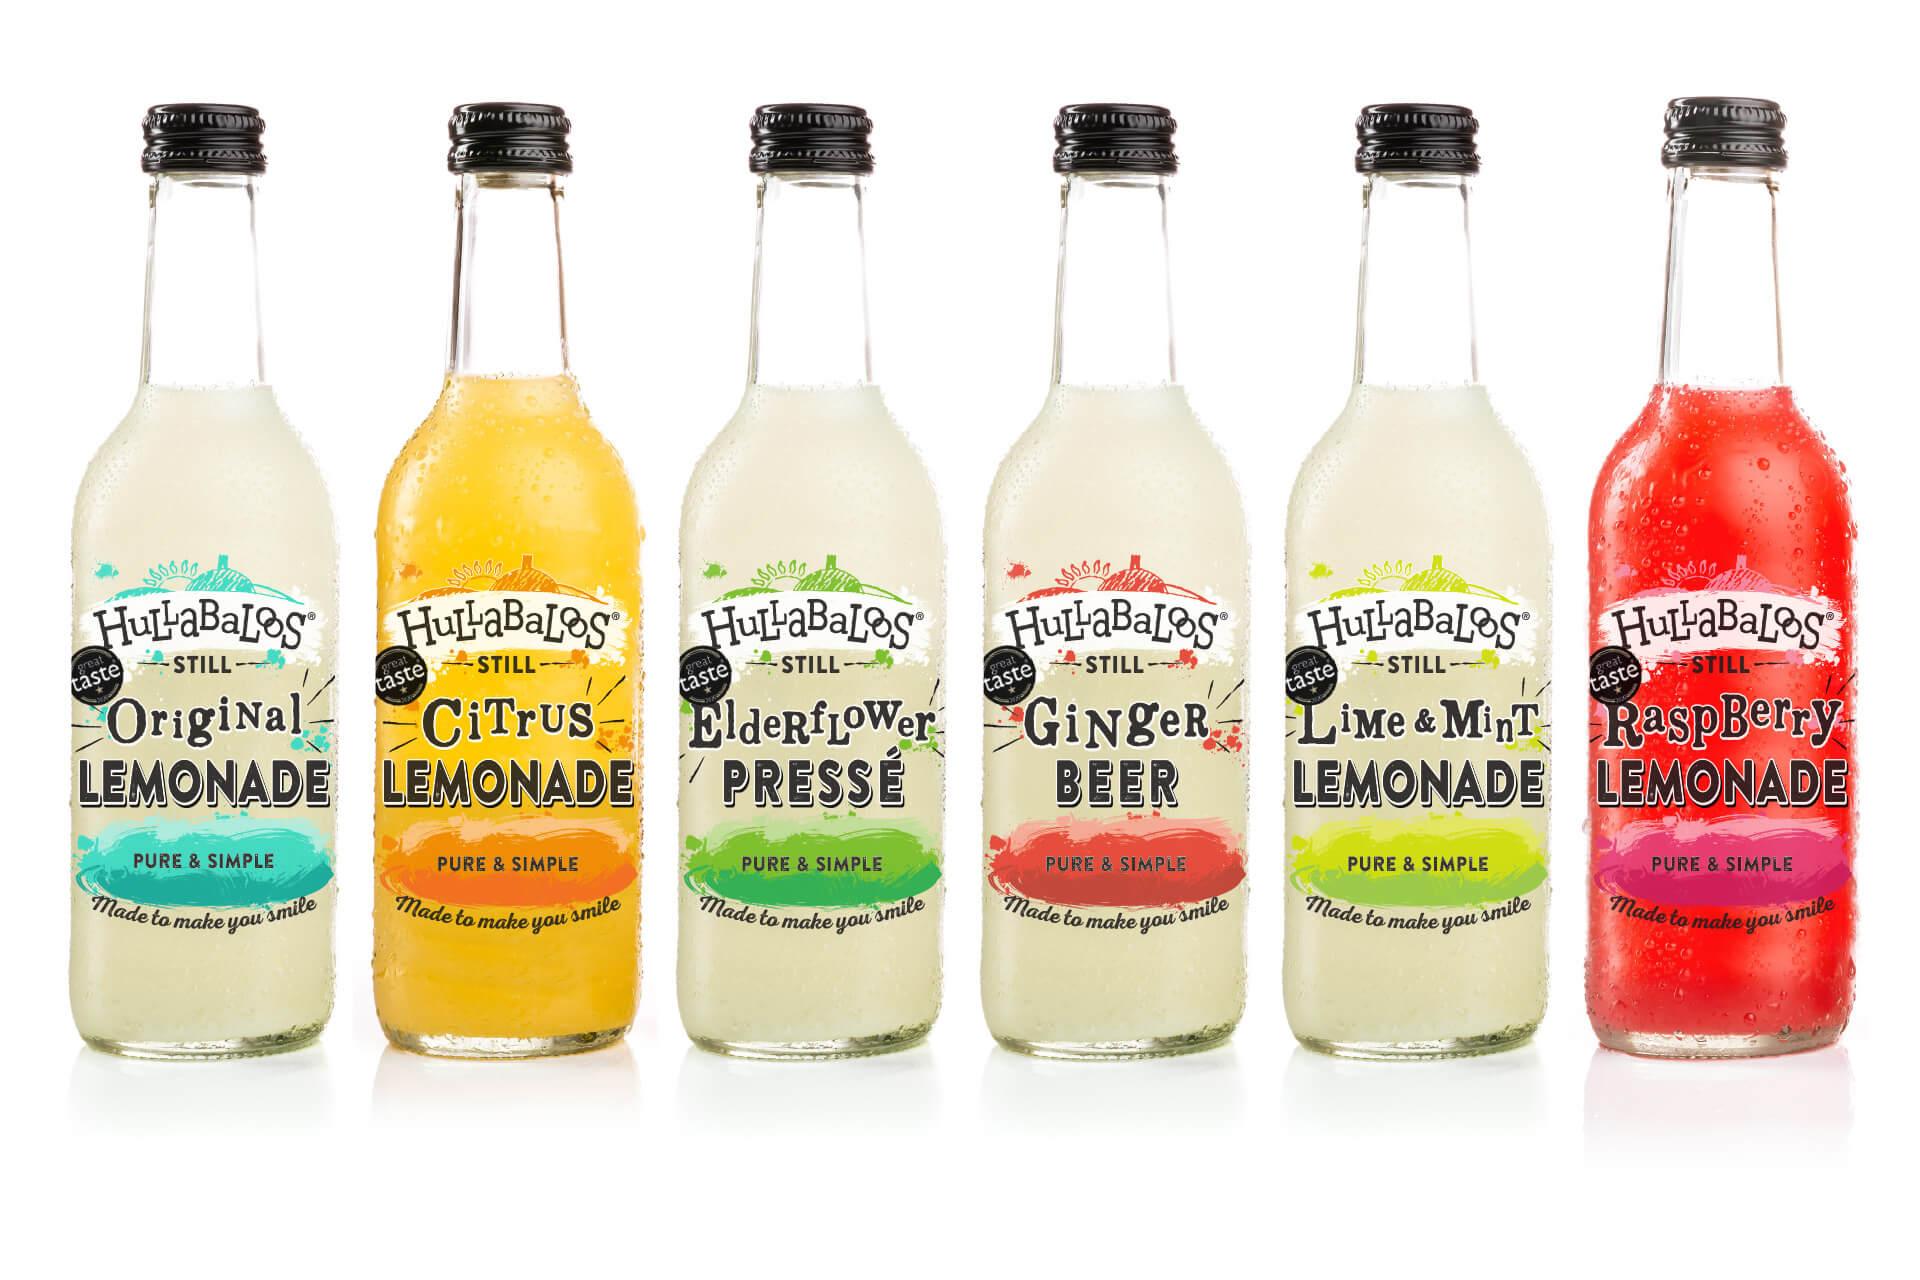 soft drinks packaging design highbridge somerset